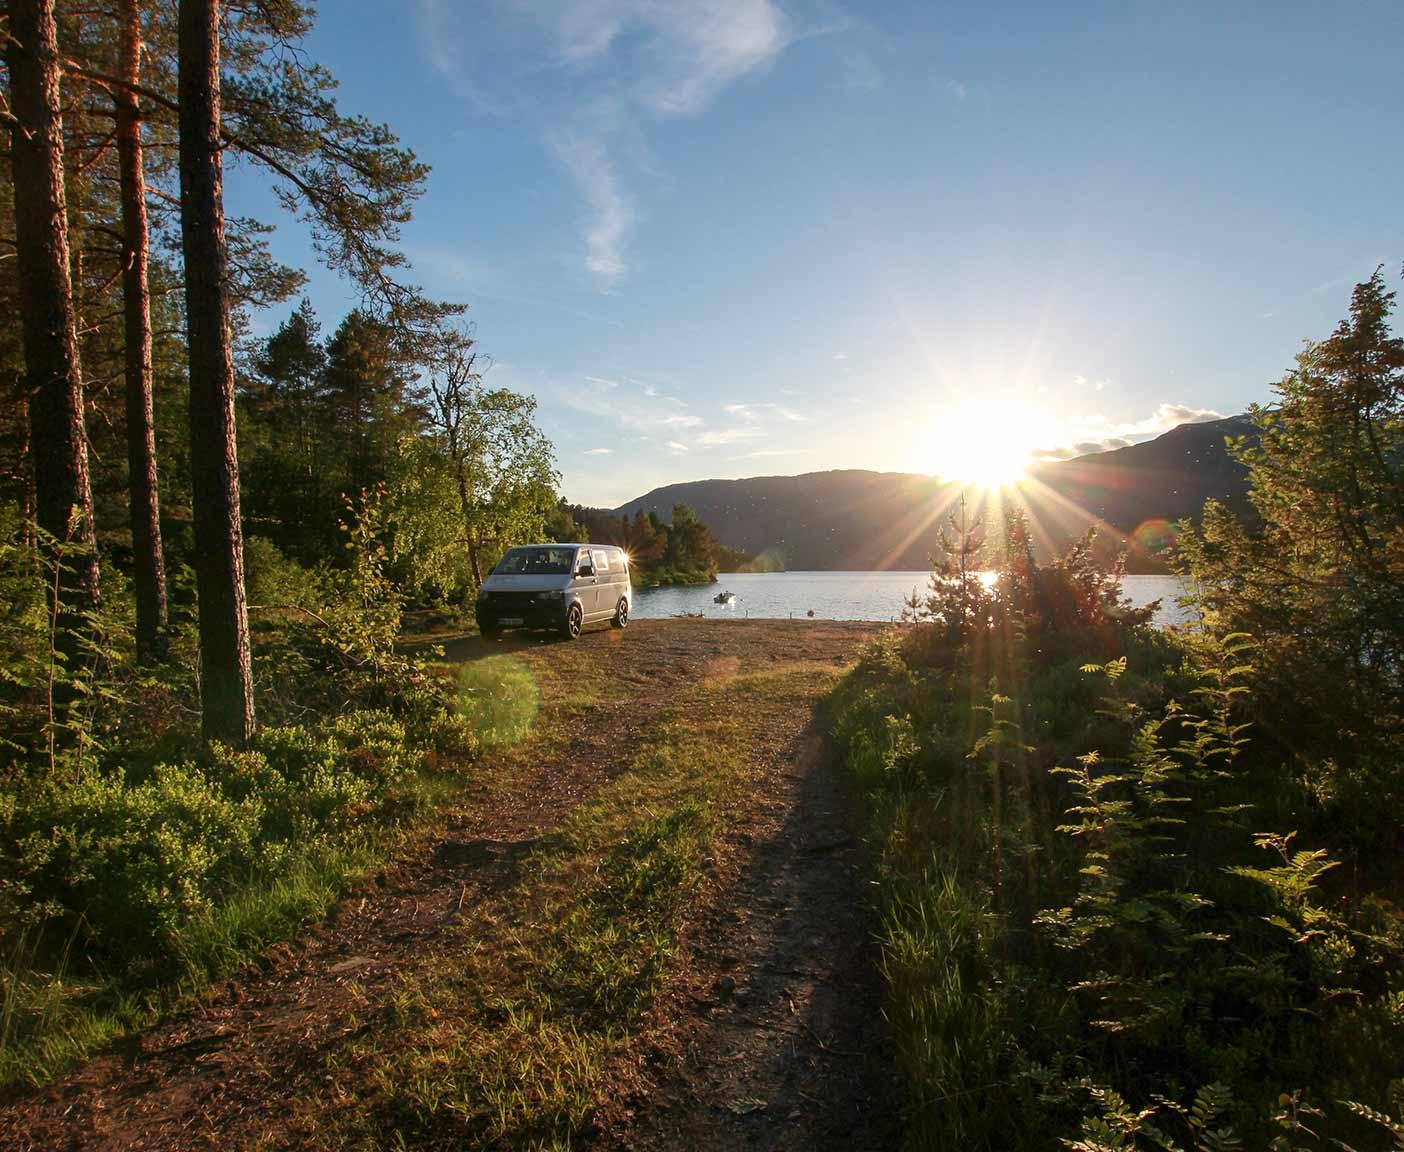 VW-T5-multivan-camper-caravelle-europatrip-van-frei-stehen-camping